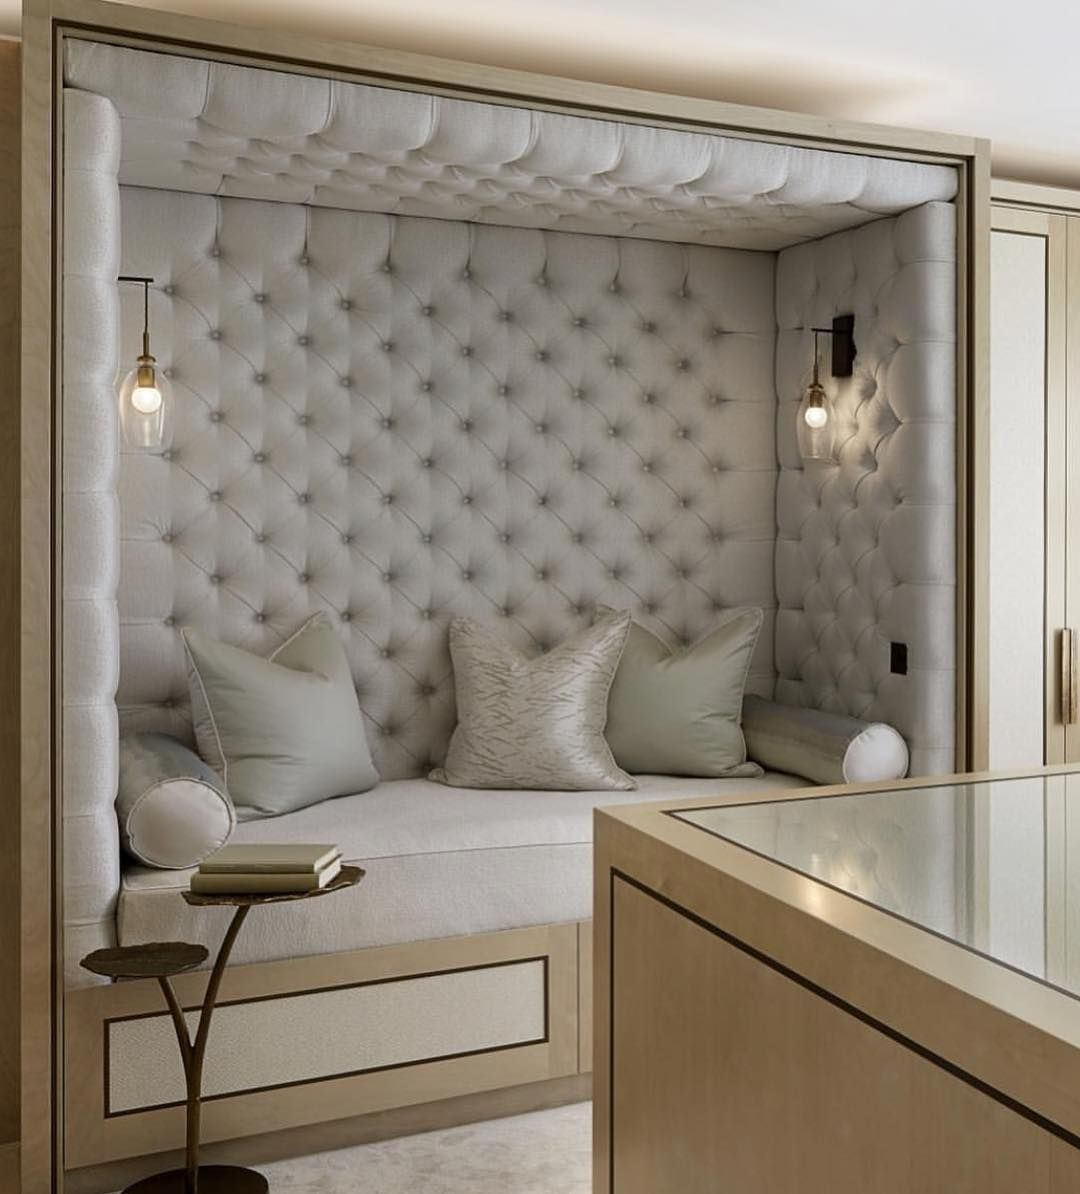 Unbelievable 10 Best Inexpensive Furniture On Amazon British Furniture Design Top Interior Design Firms Inexpensive Furniture